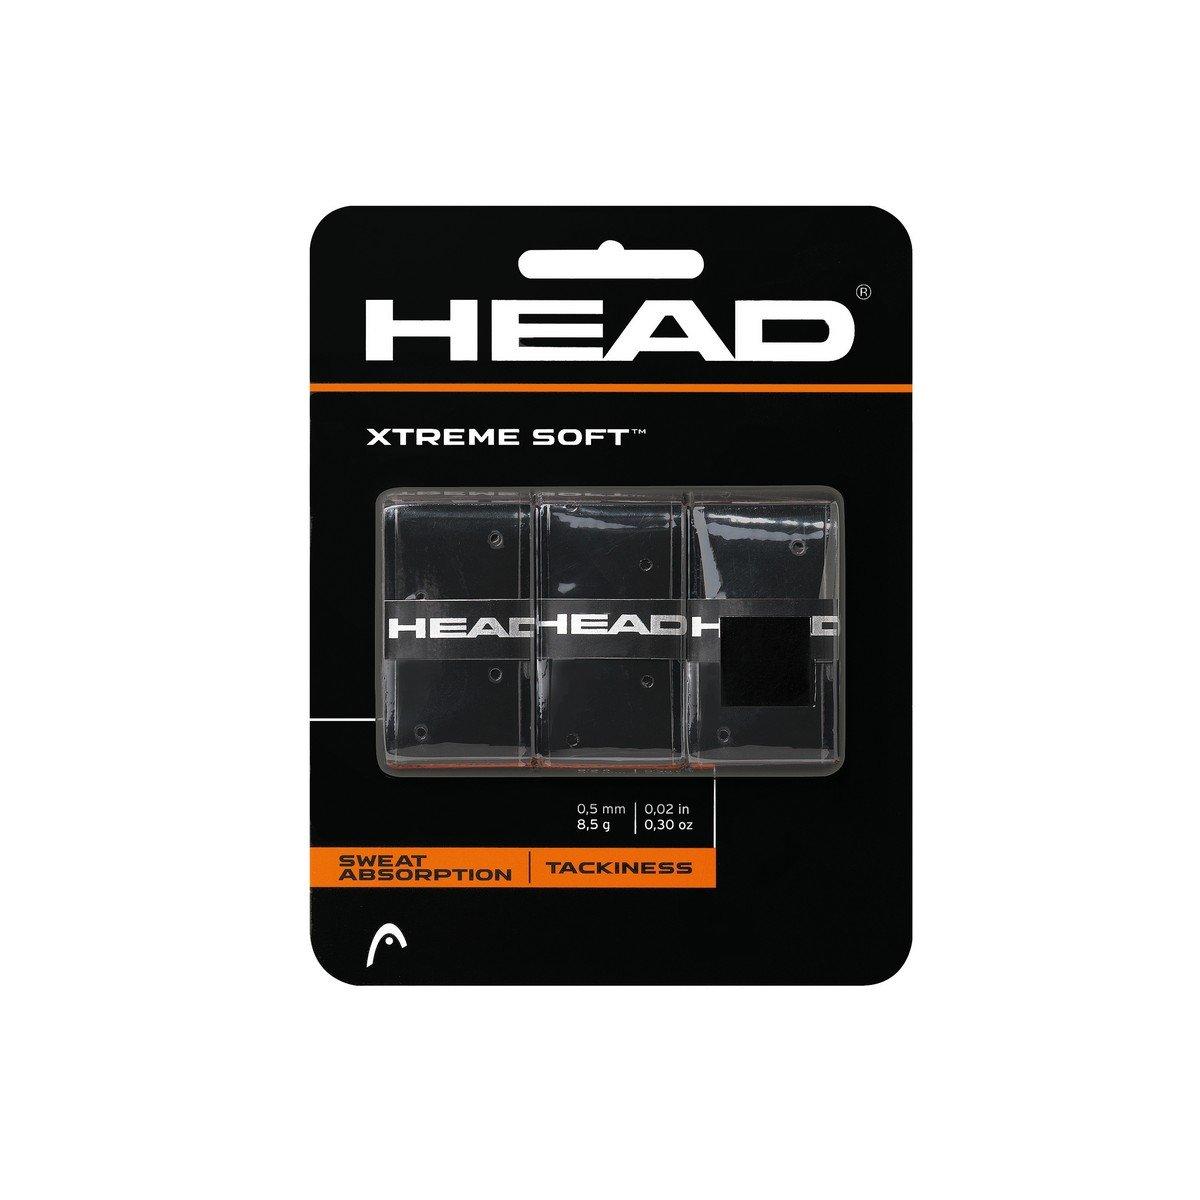 Head Xtreme Soft Overwrap - Grip, color azul 285104-BL